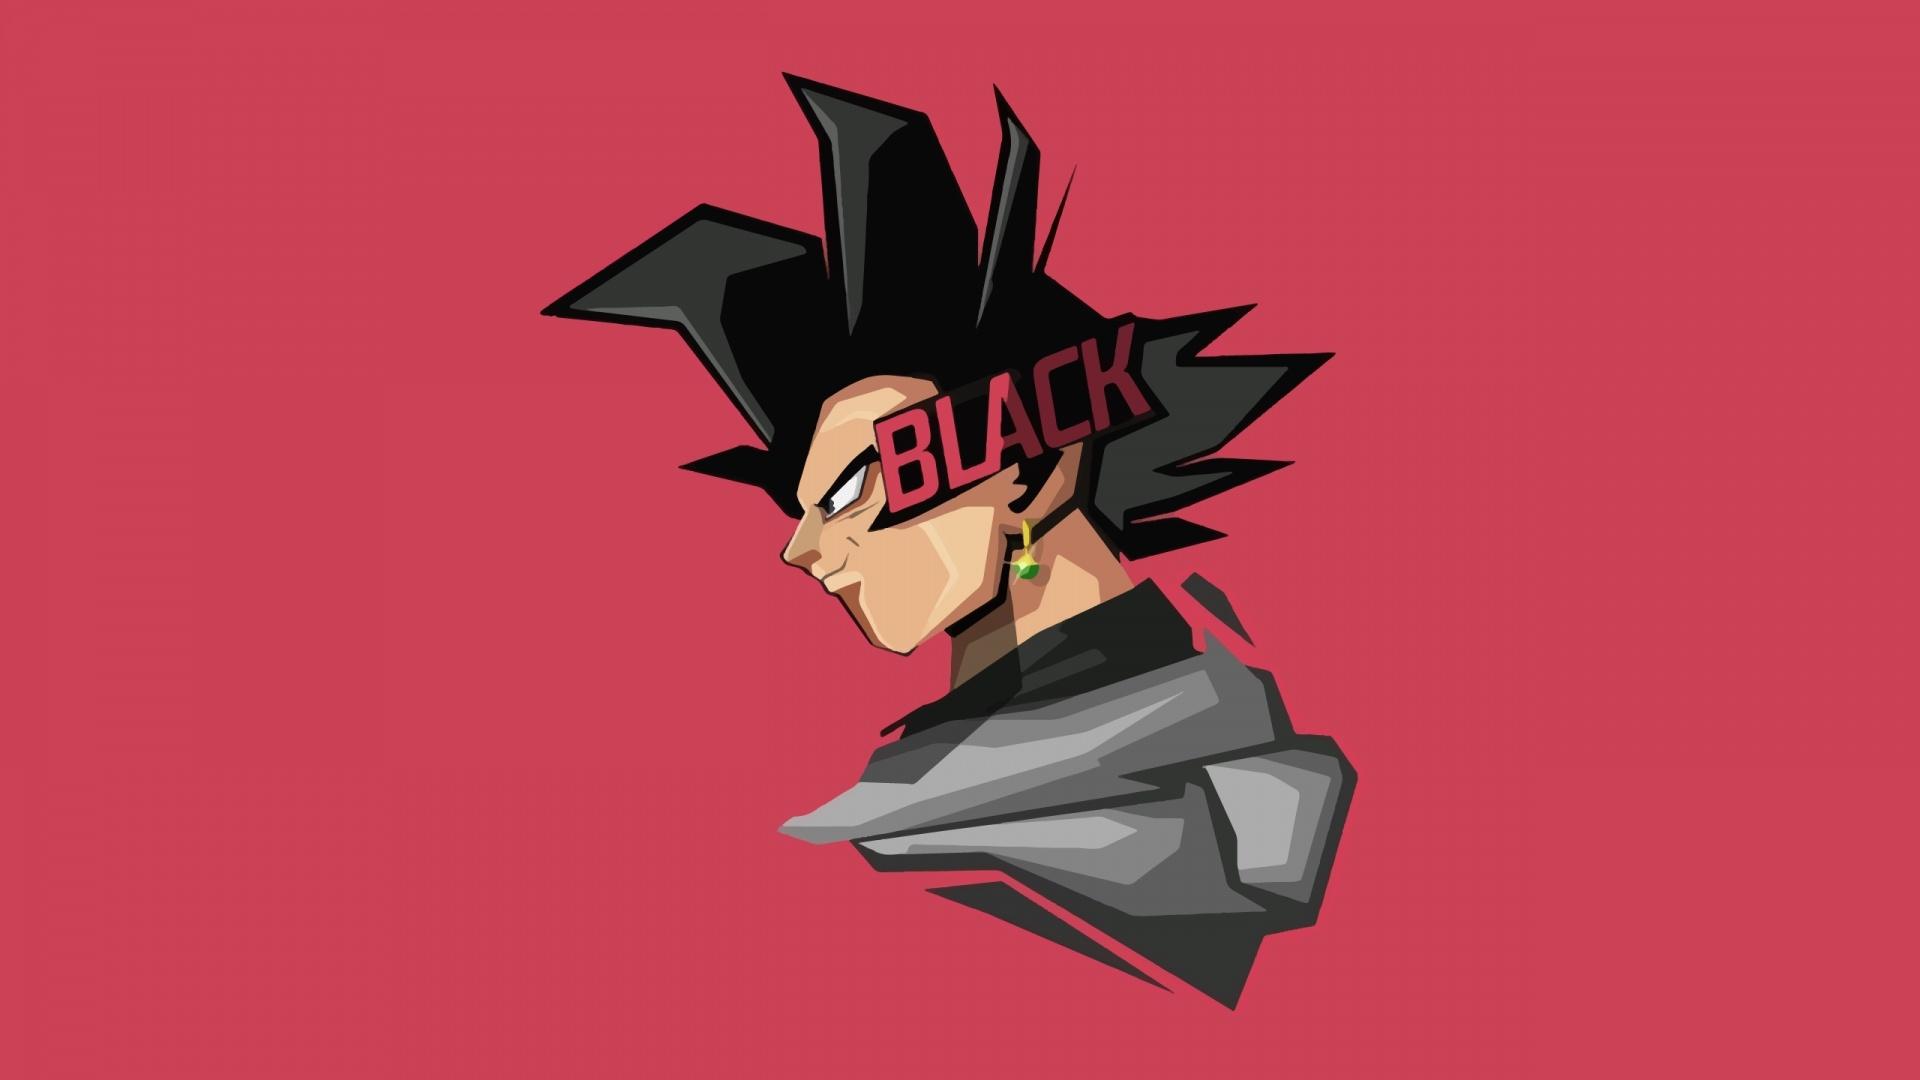 Goku Black background wallpaper